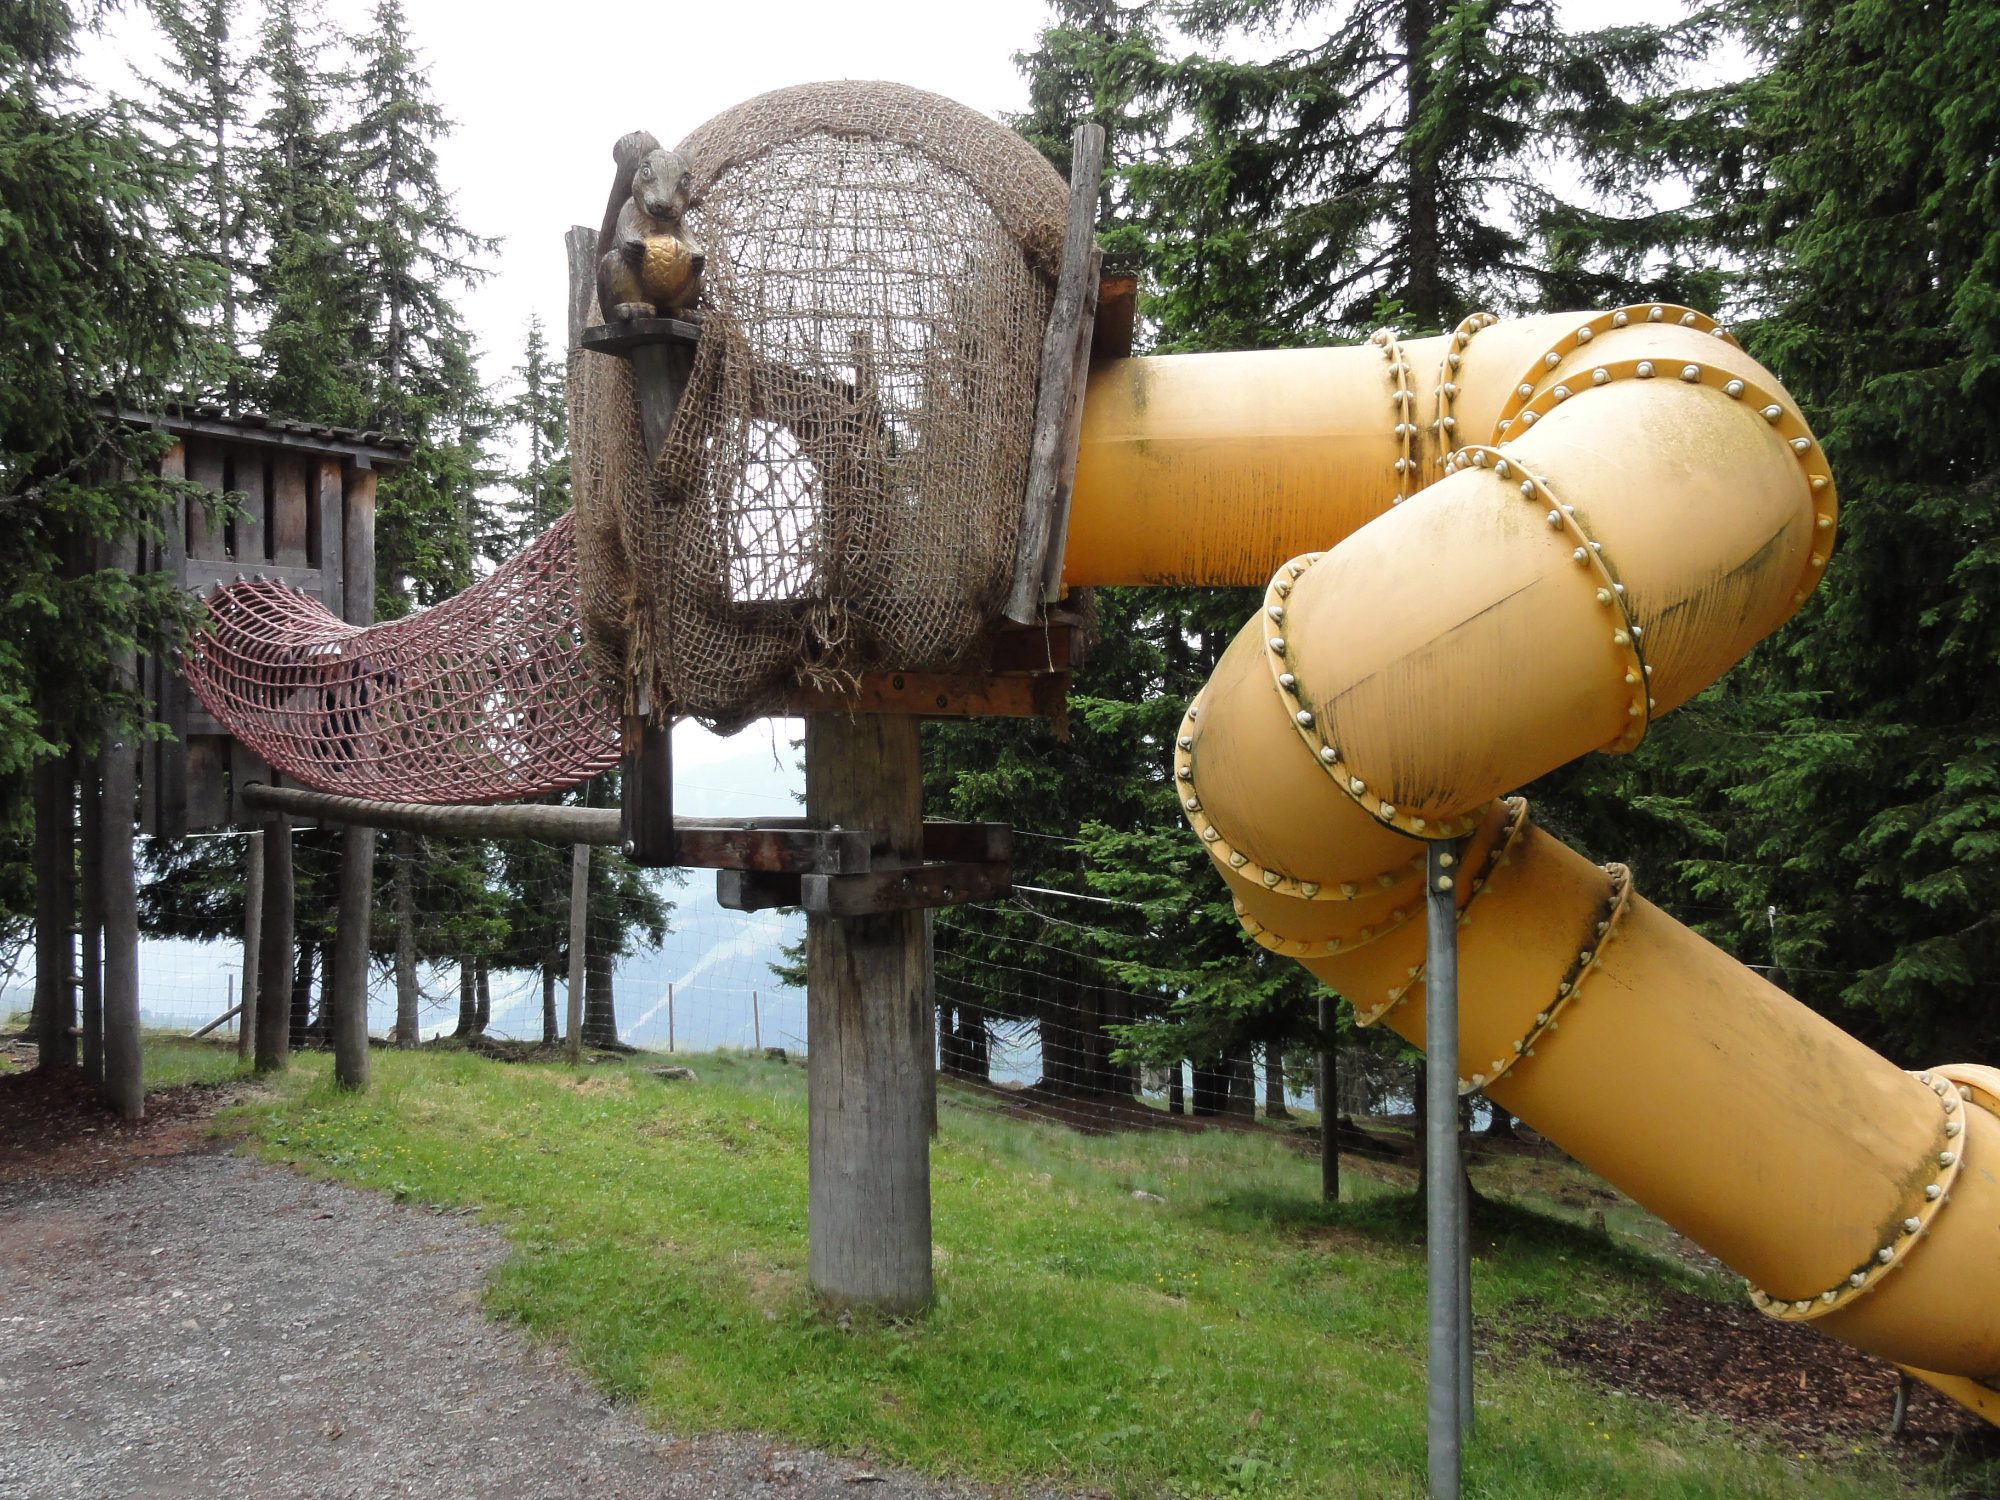 Montelino's Erlebnisweg - Spielstation